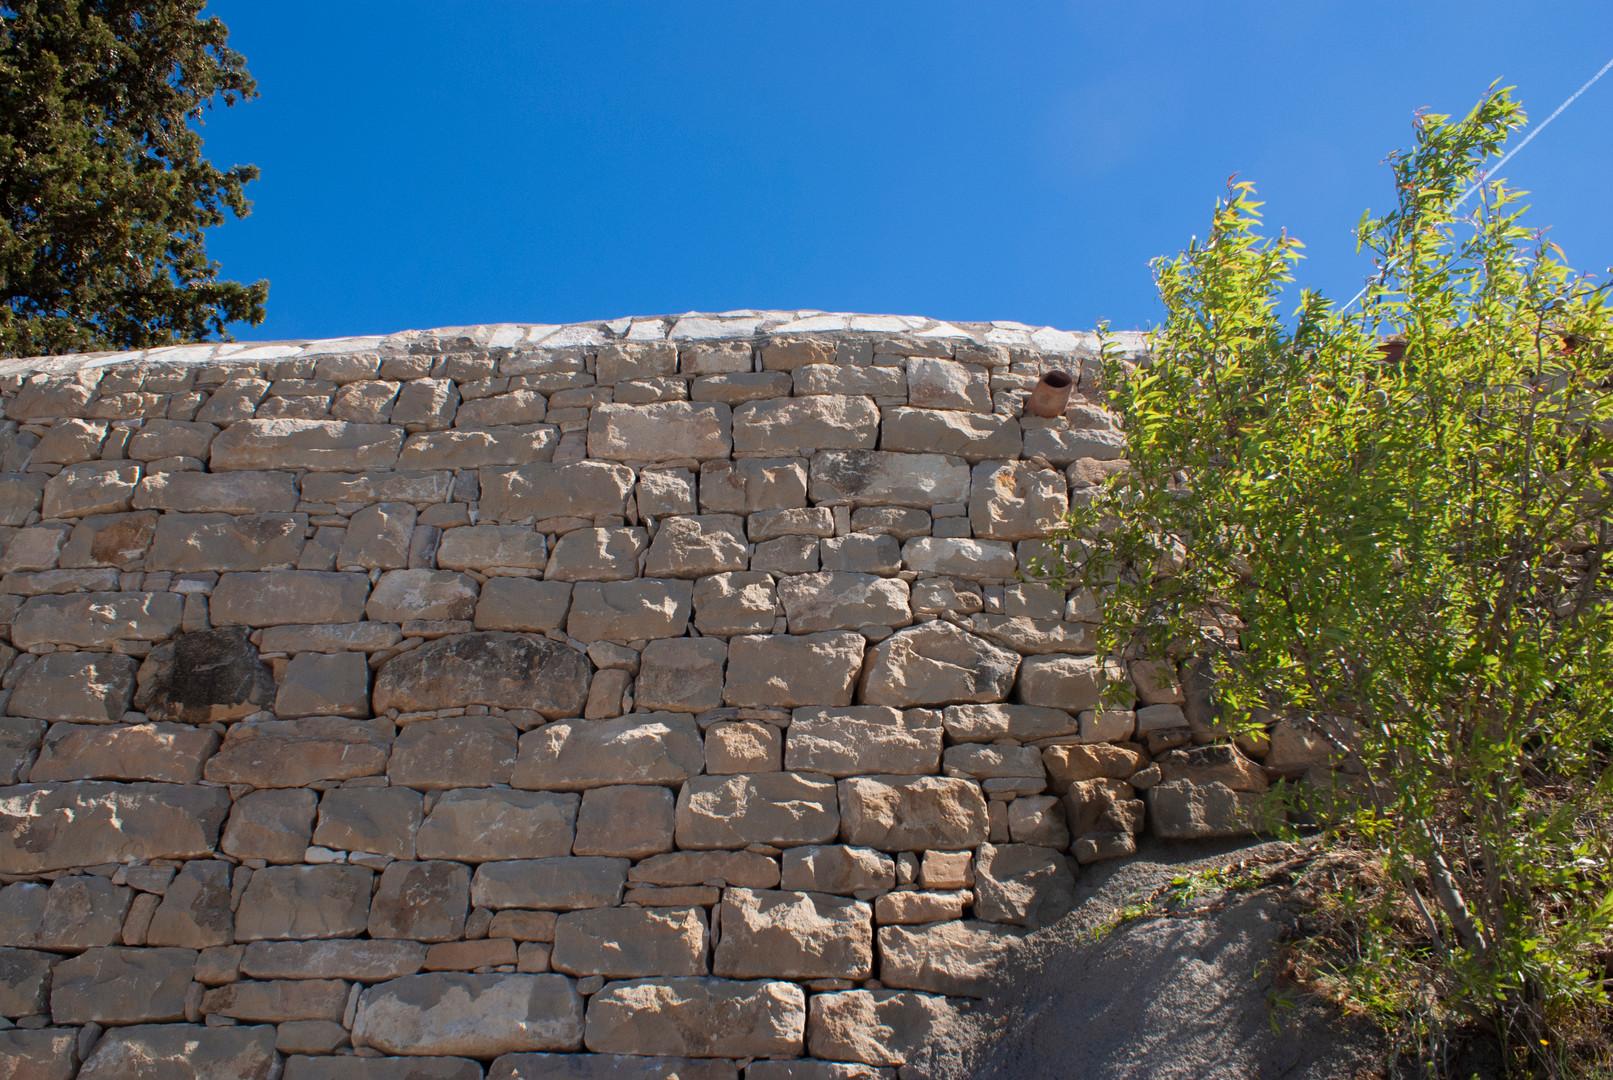 Marge de pedra seca